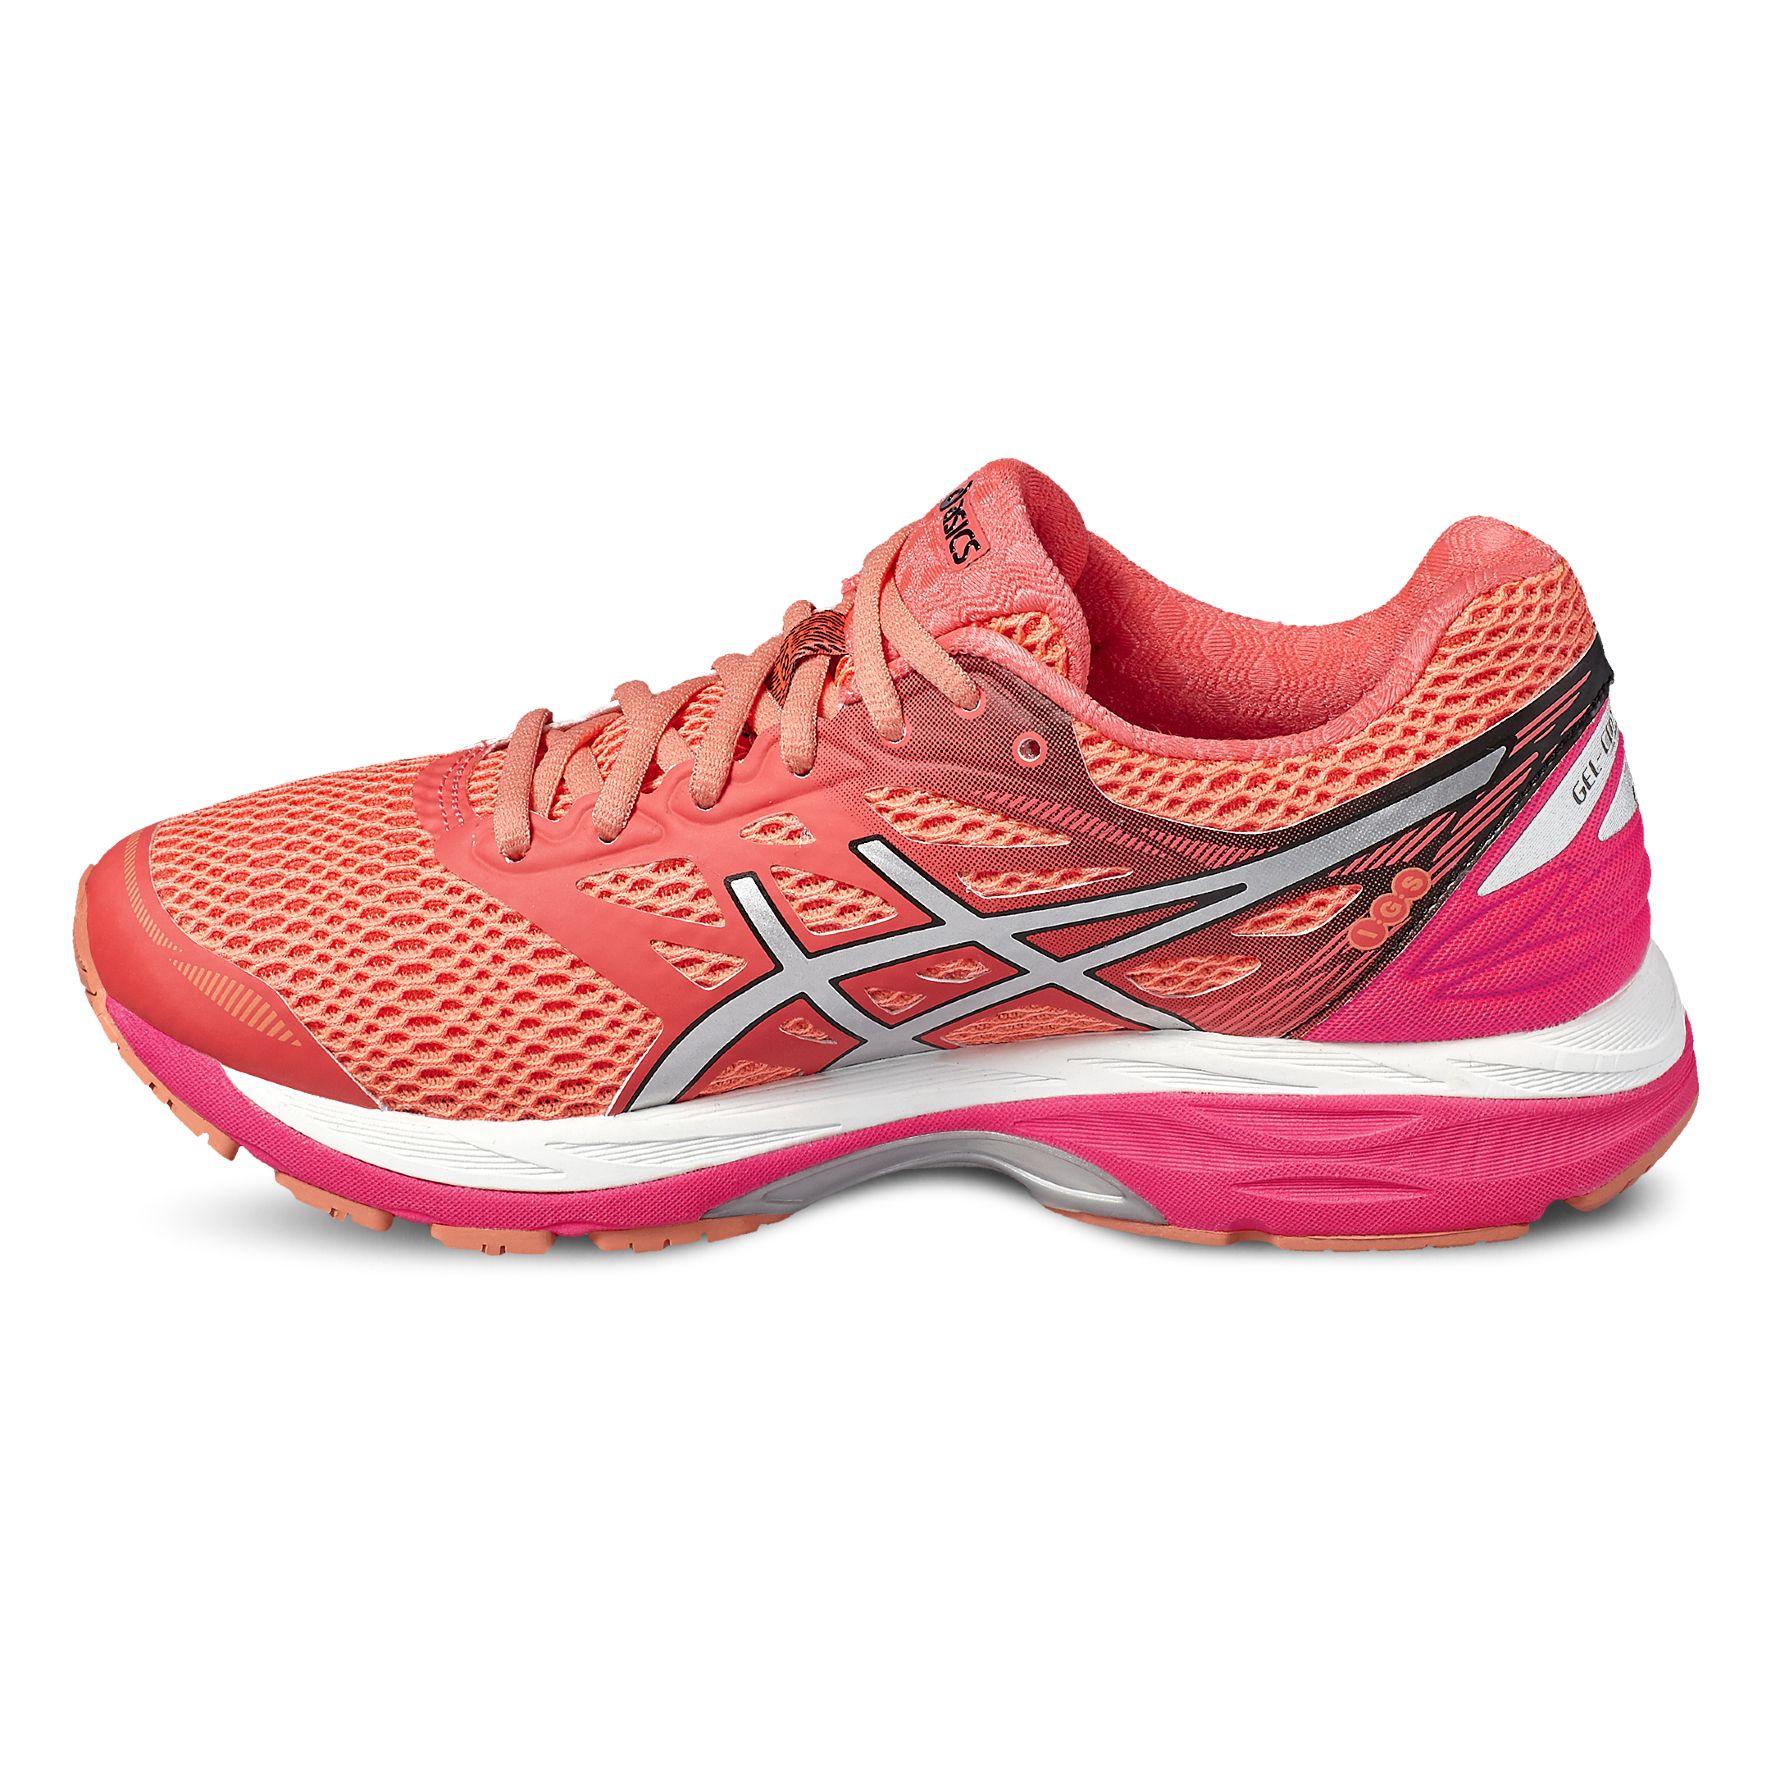 Asics Ladies Running Shoes Sale